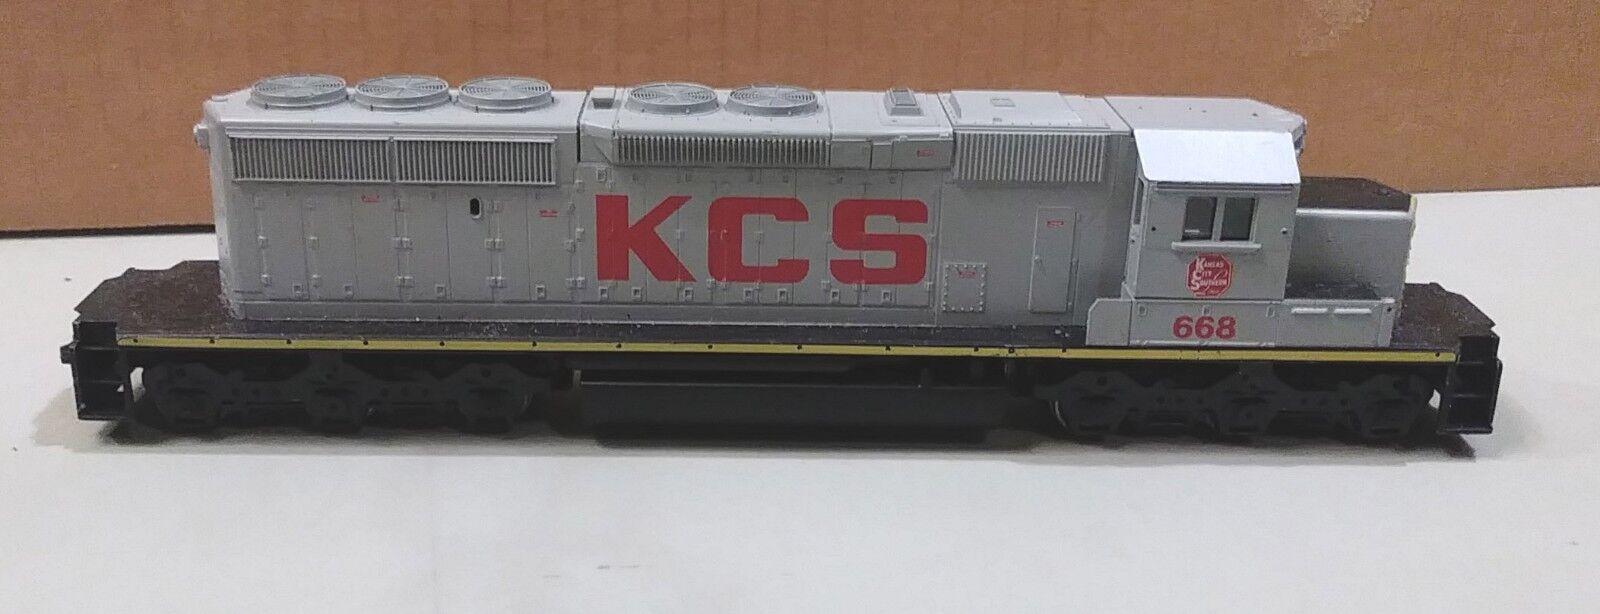 Athearn Kansas City Southern H O Locomotive